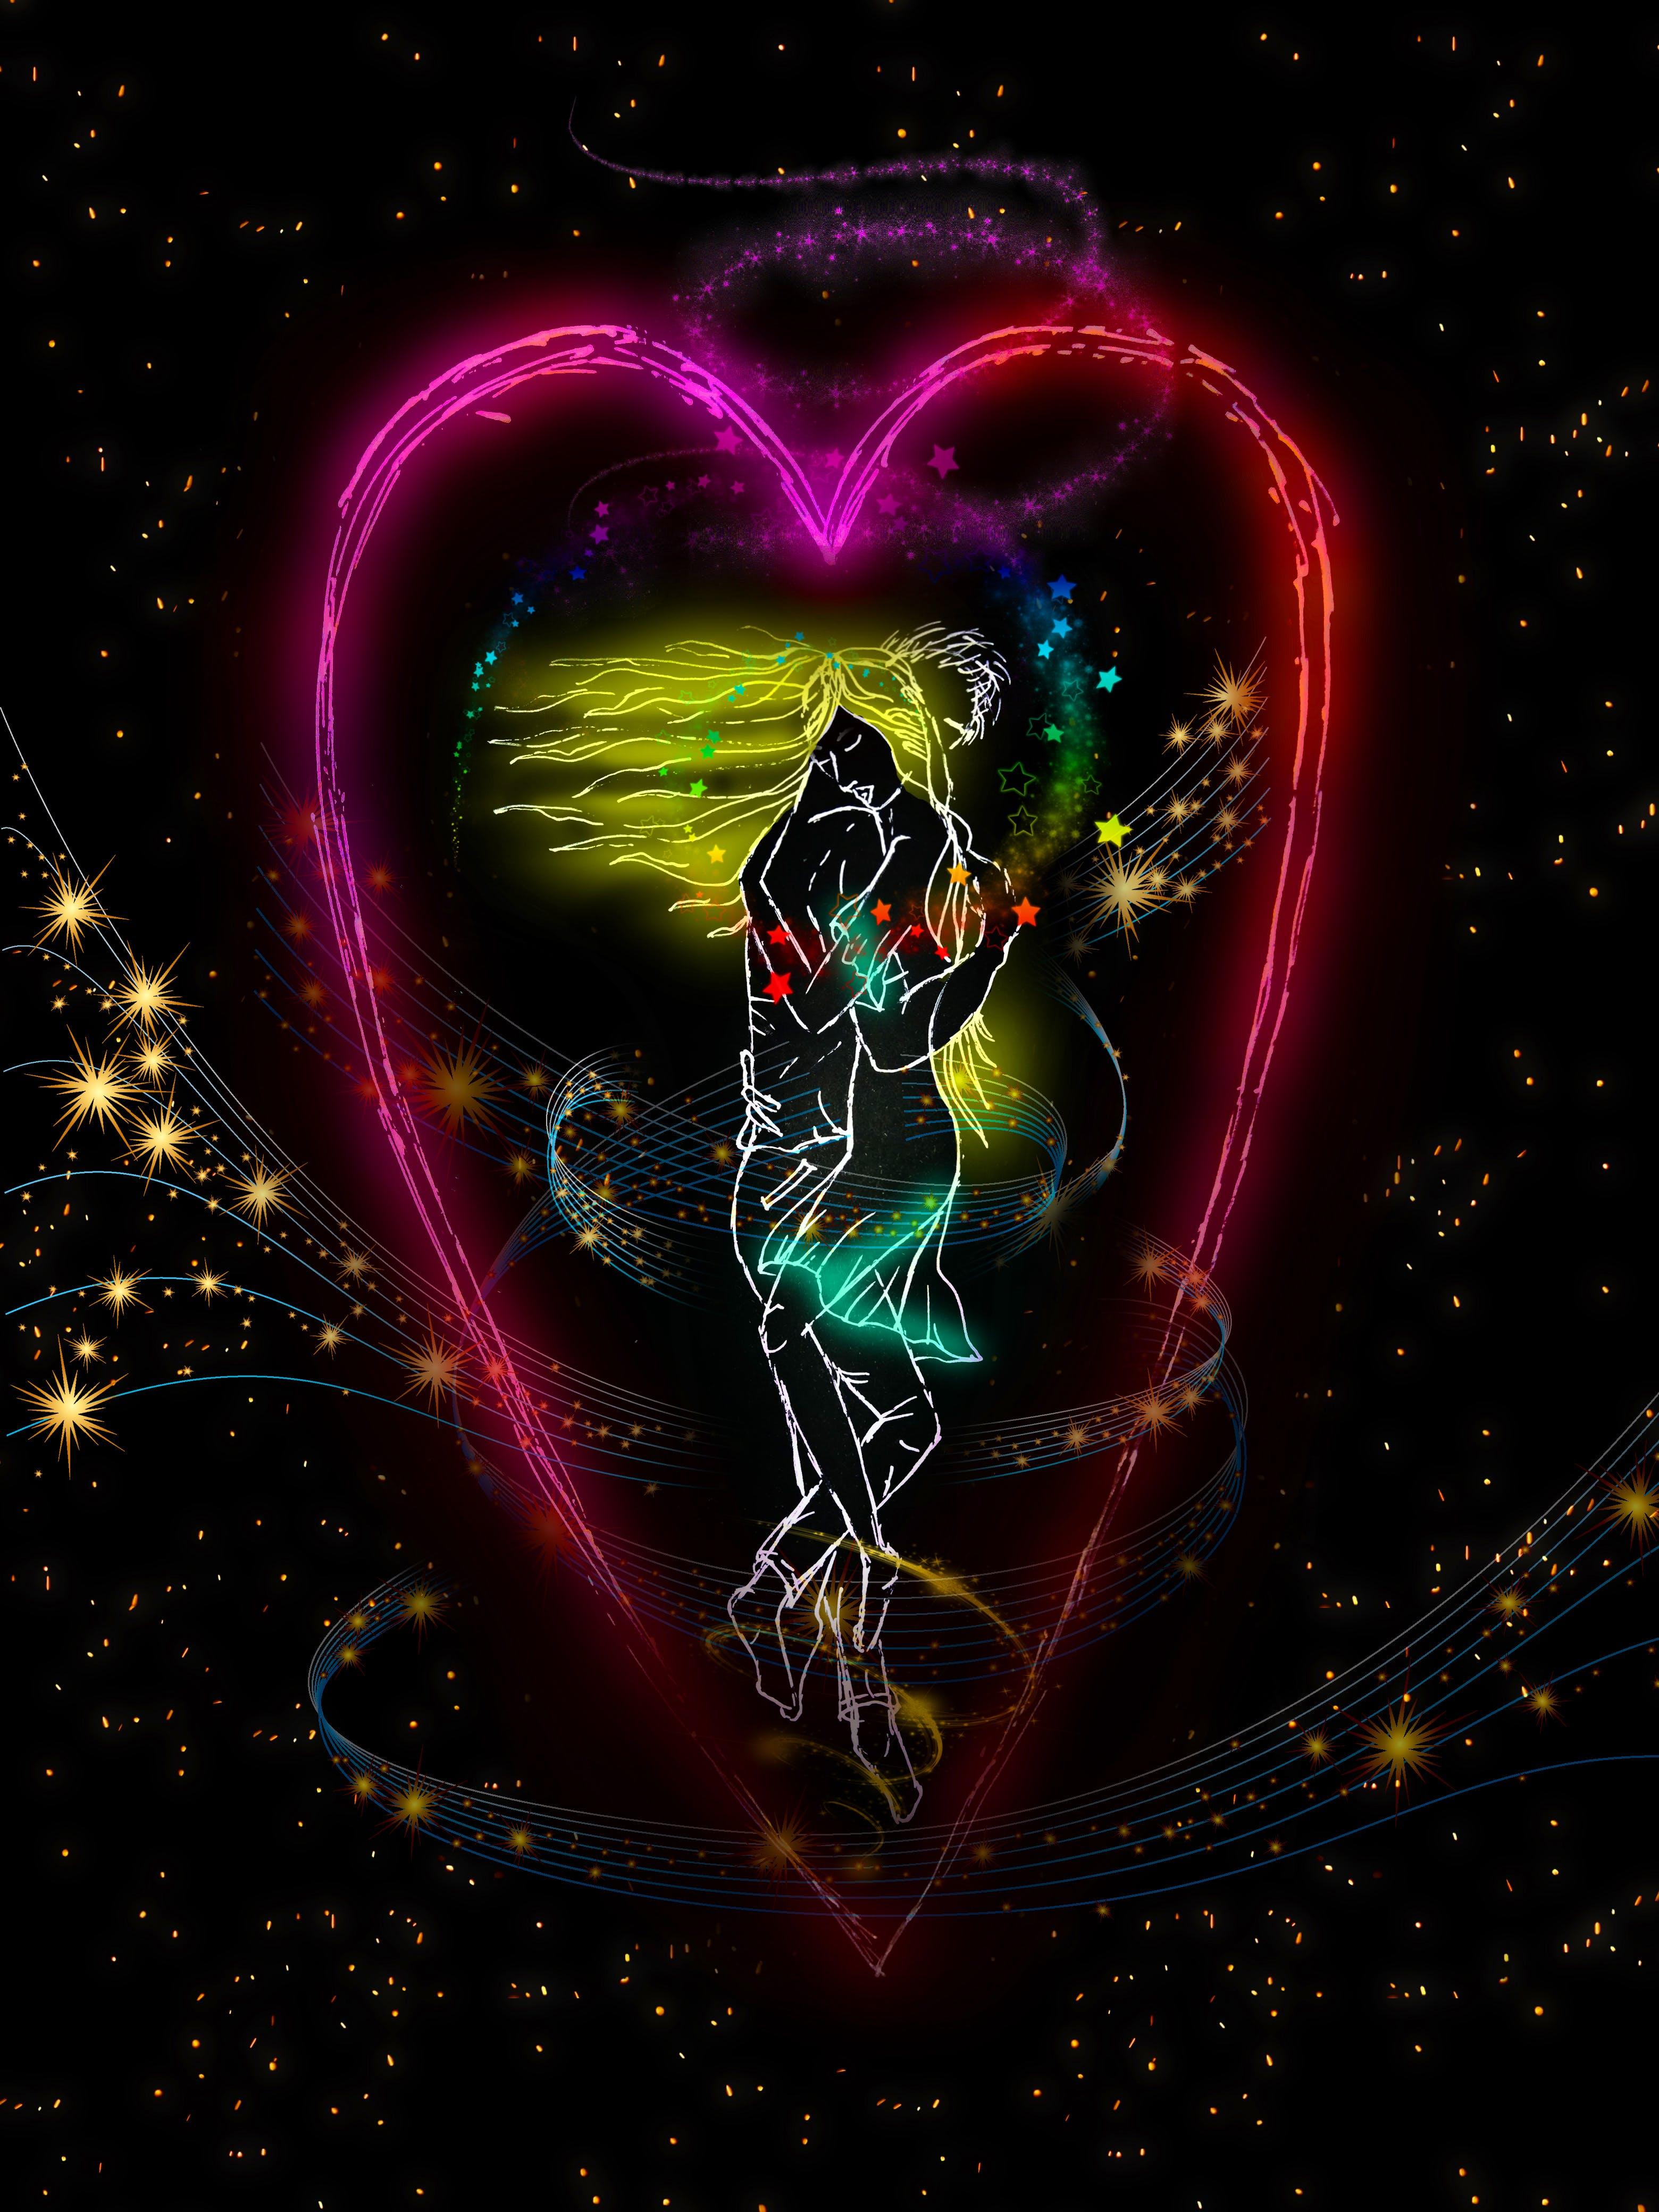 of AMO, fantasy, liebe, love